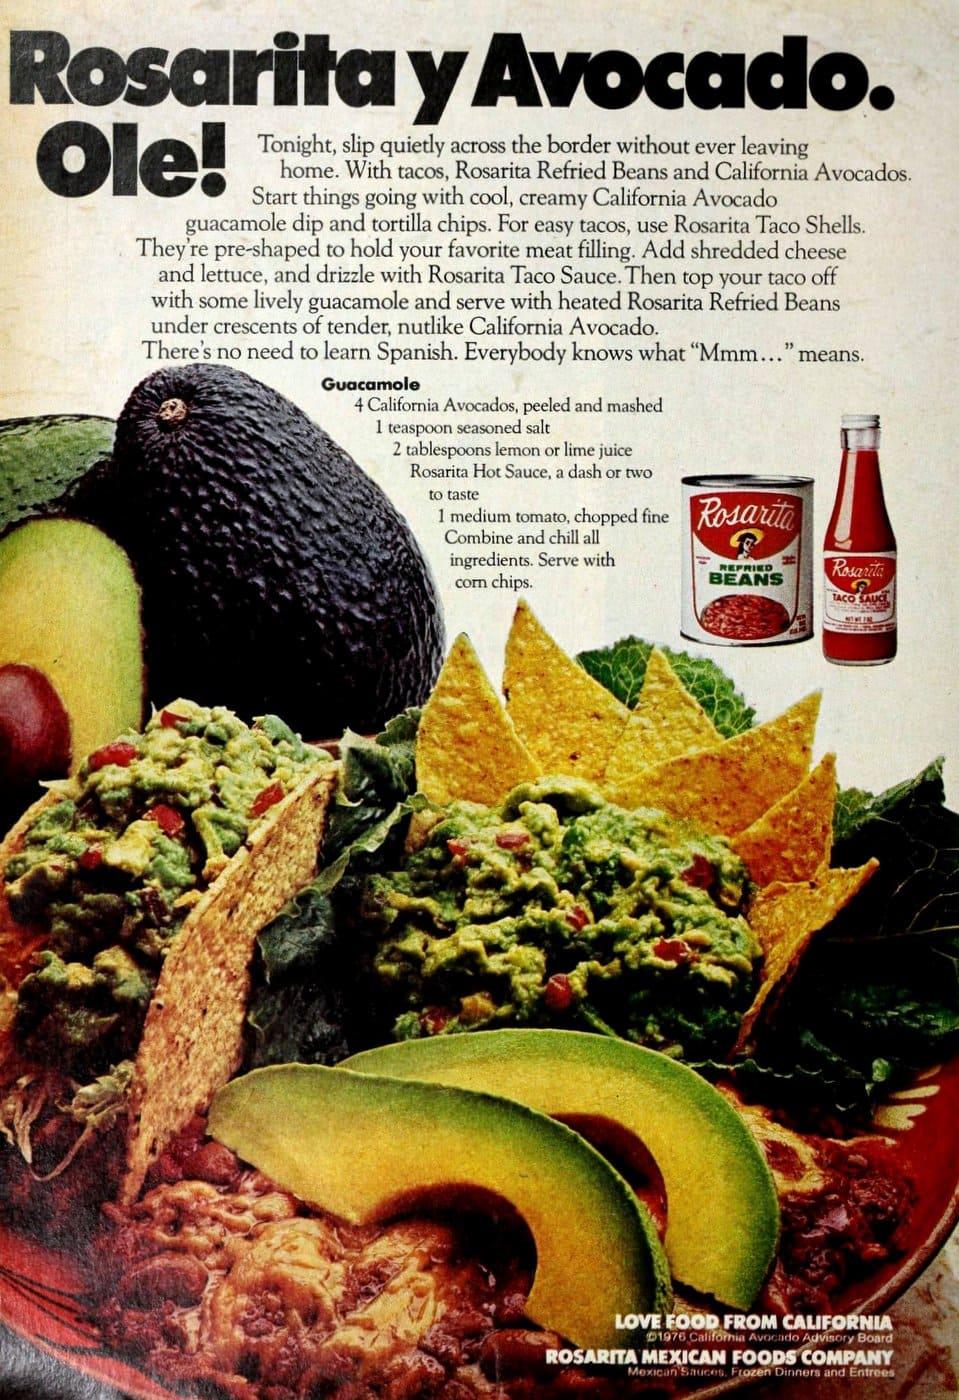 Rosarita guacamole recipe (c1980s)